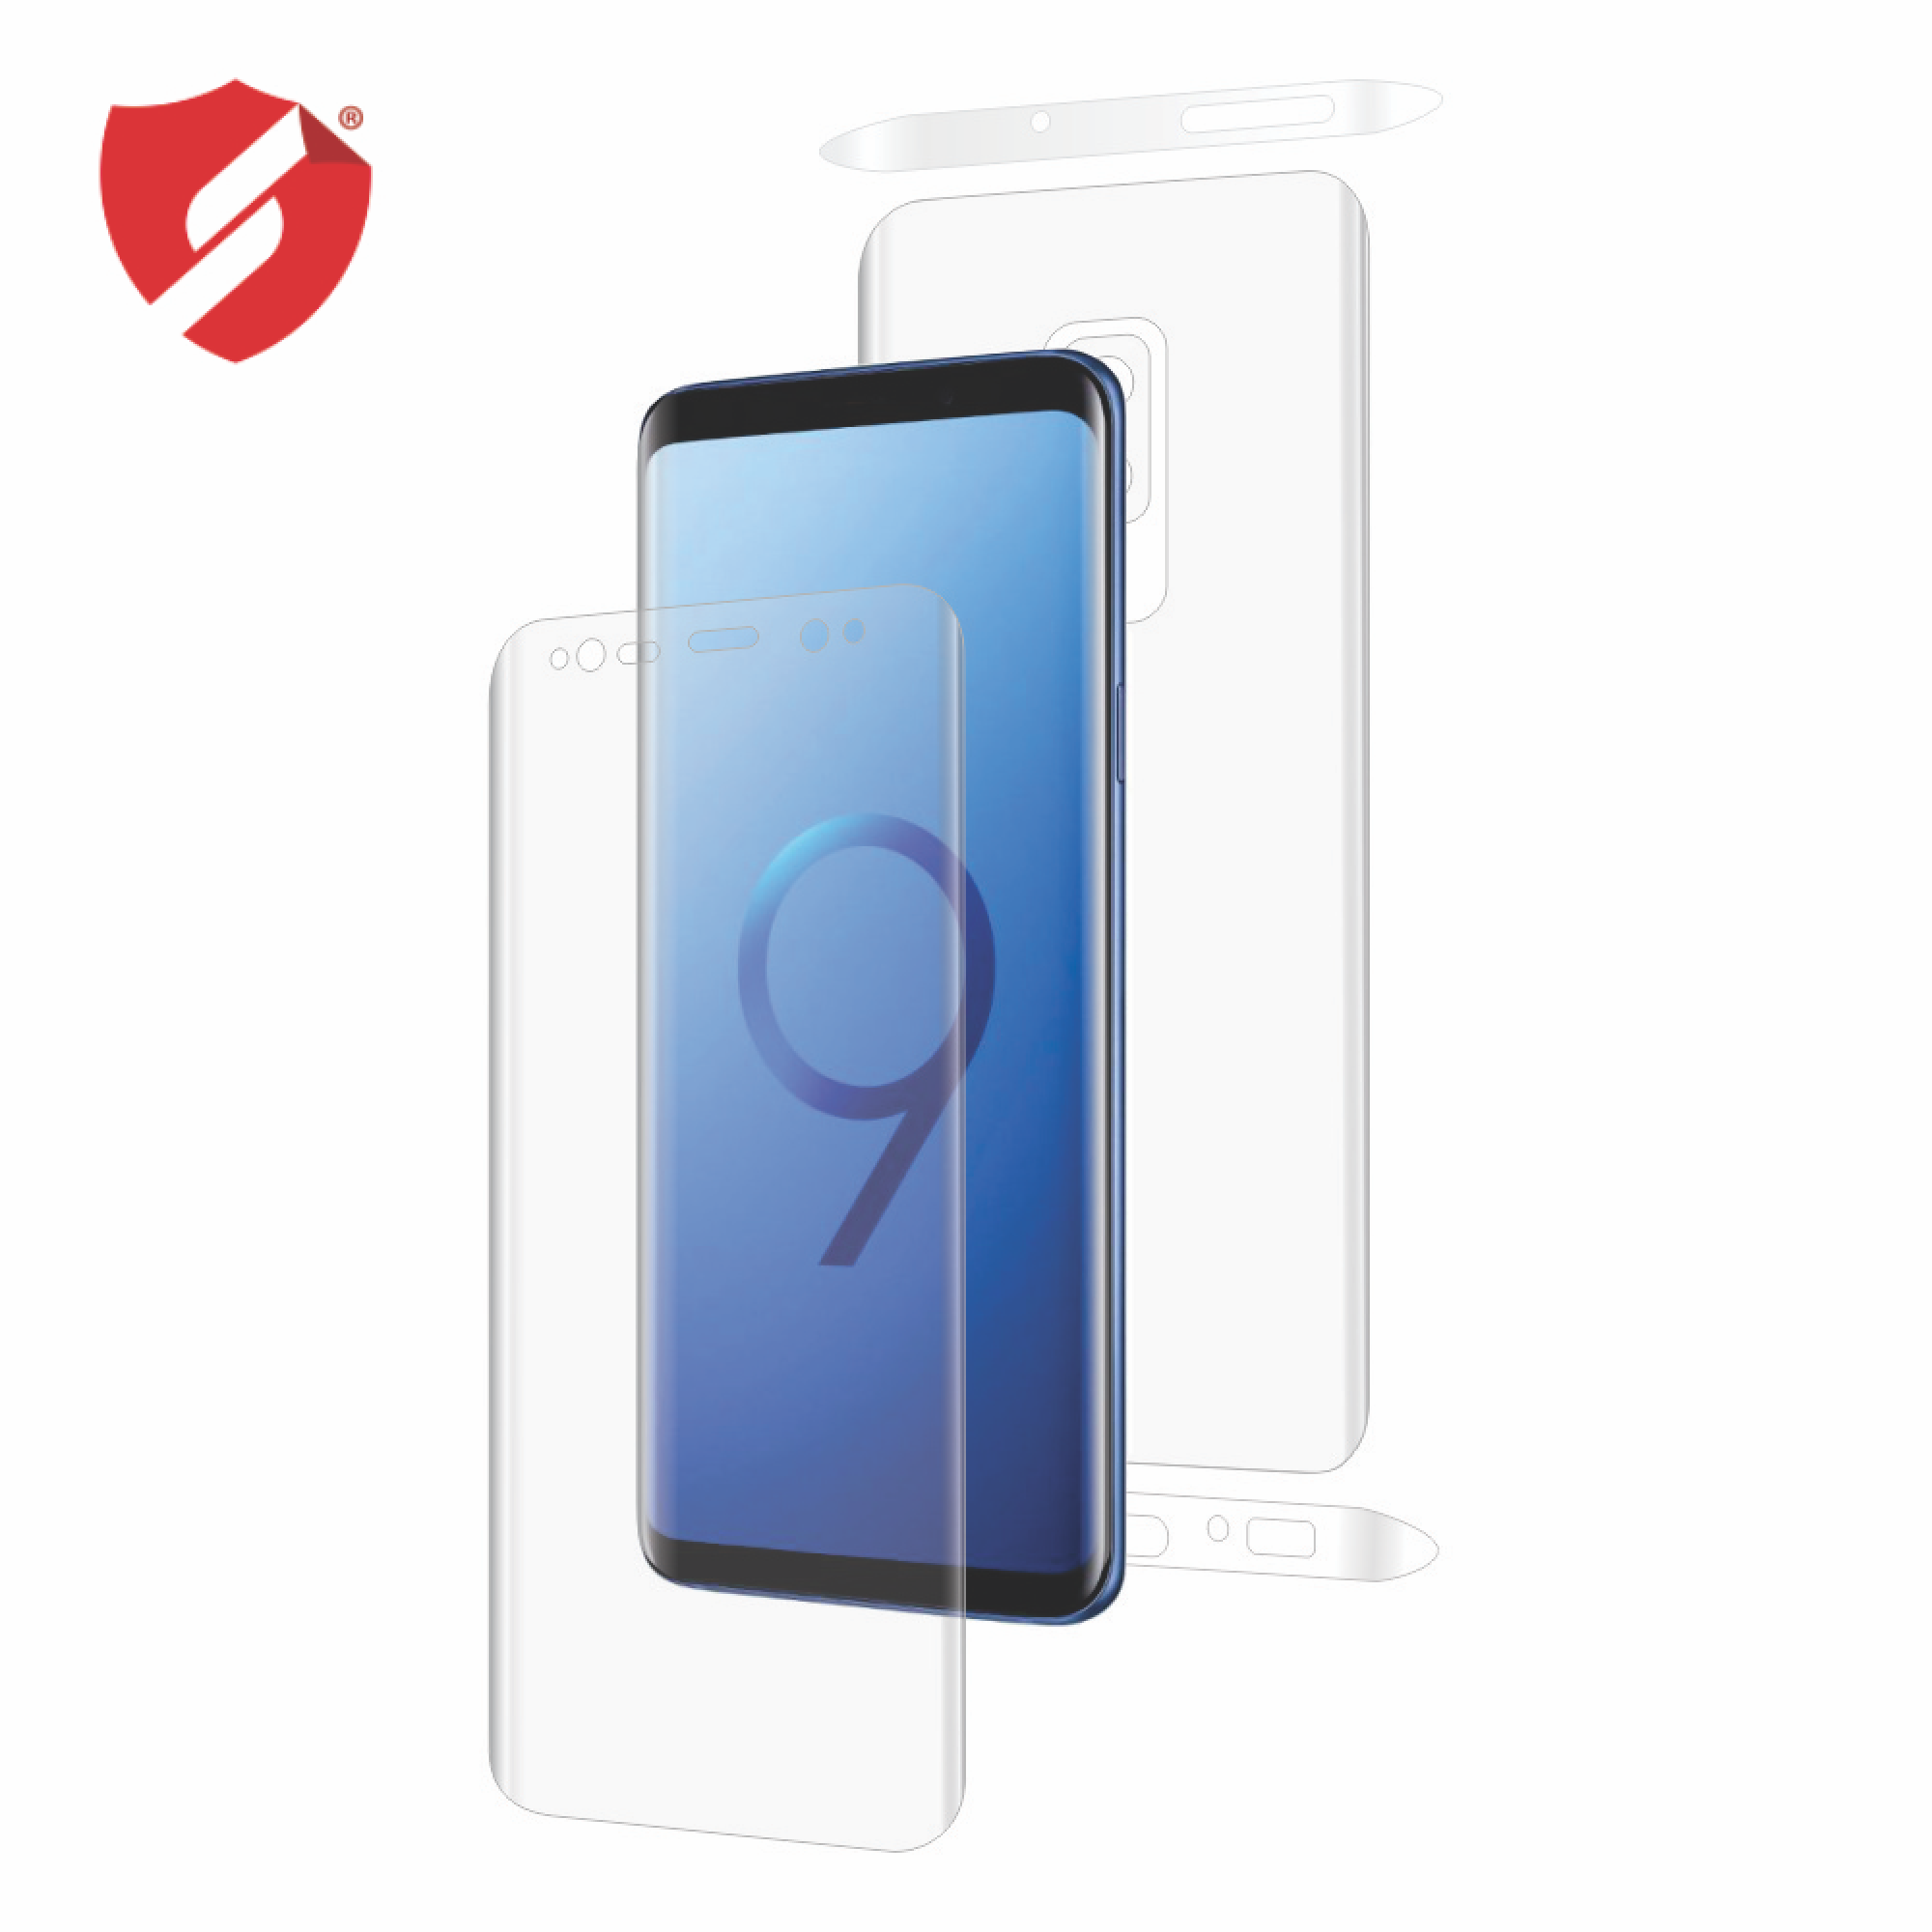 Folie de protectie Smart Protection Samsung Galaxy S9 Plus compatibila cu carcasa Spigen Thin Fit - fullbody - display + spate + laterale imagine